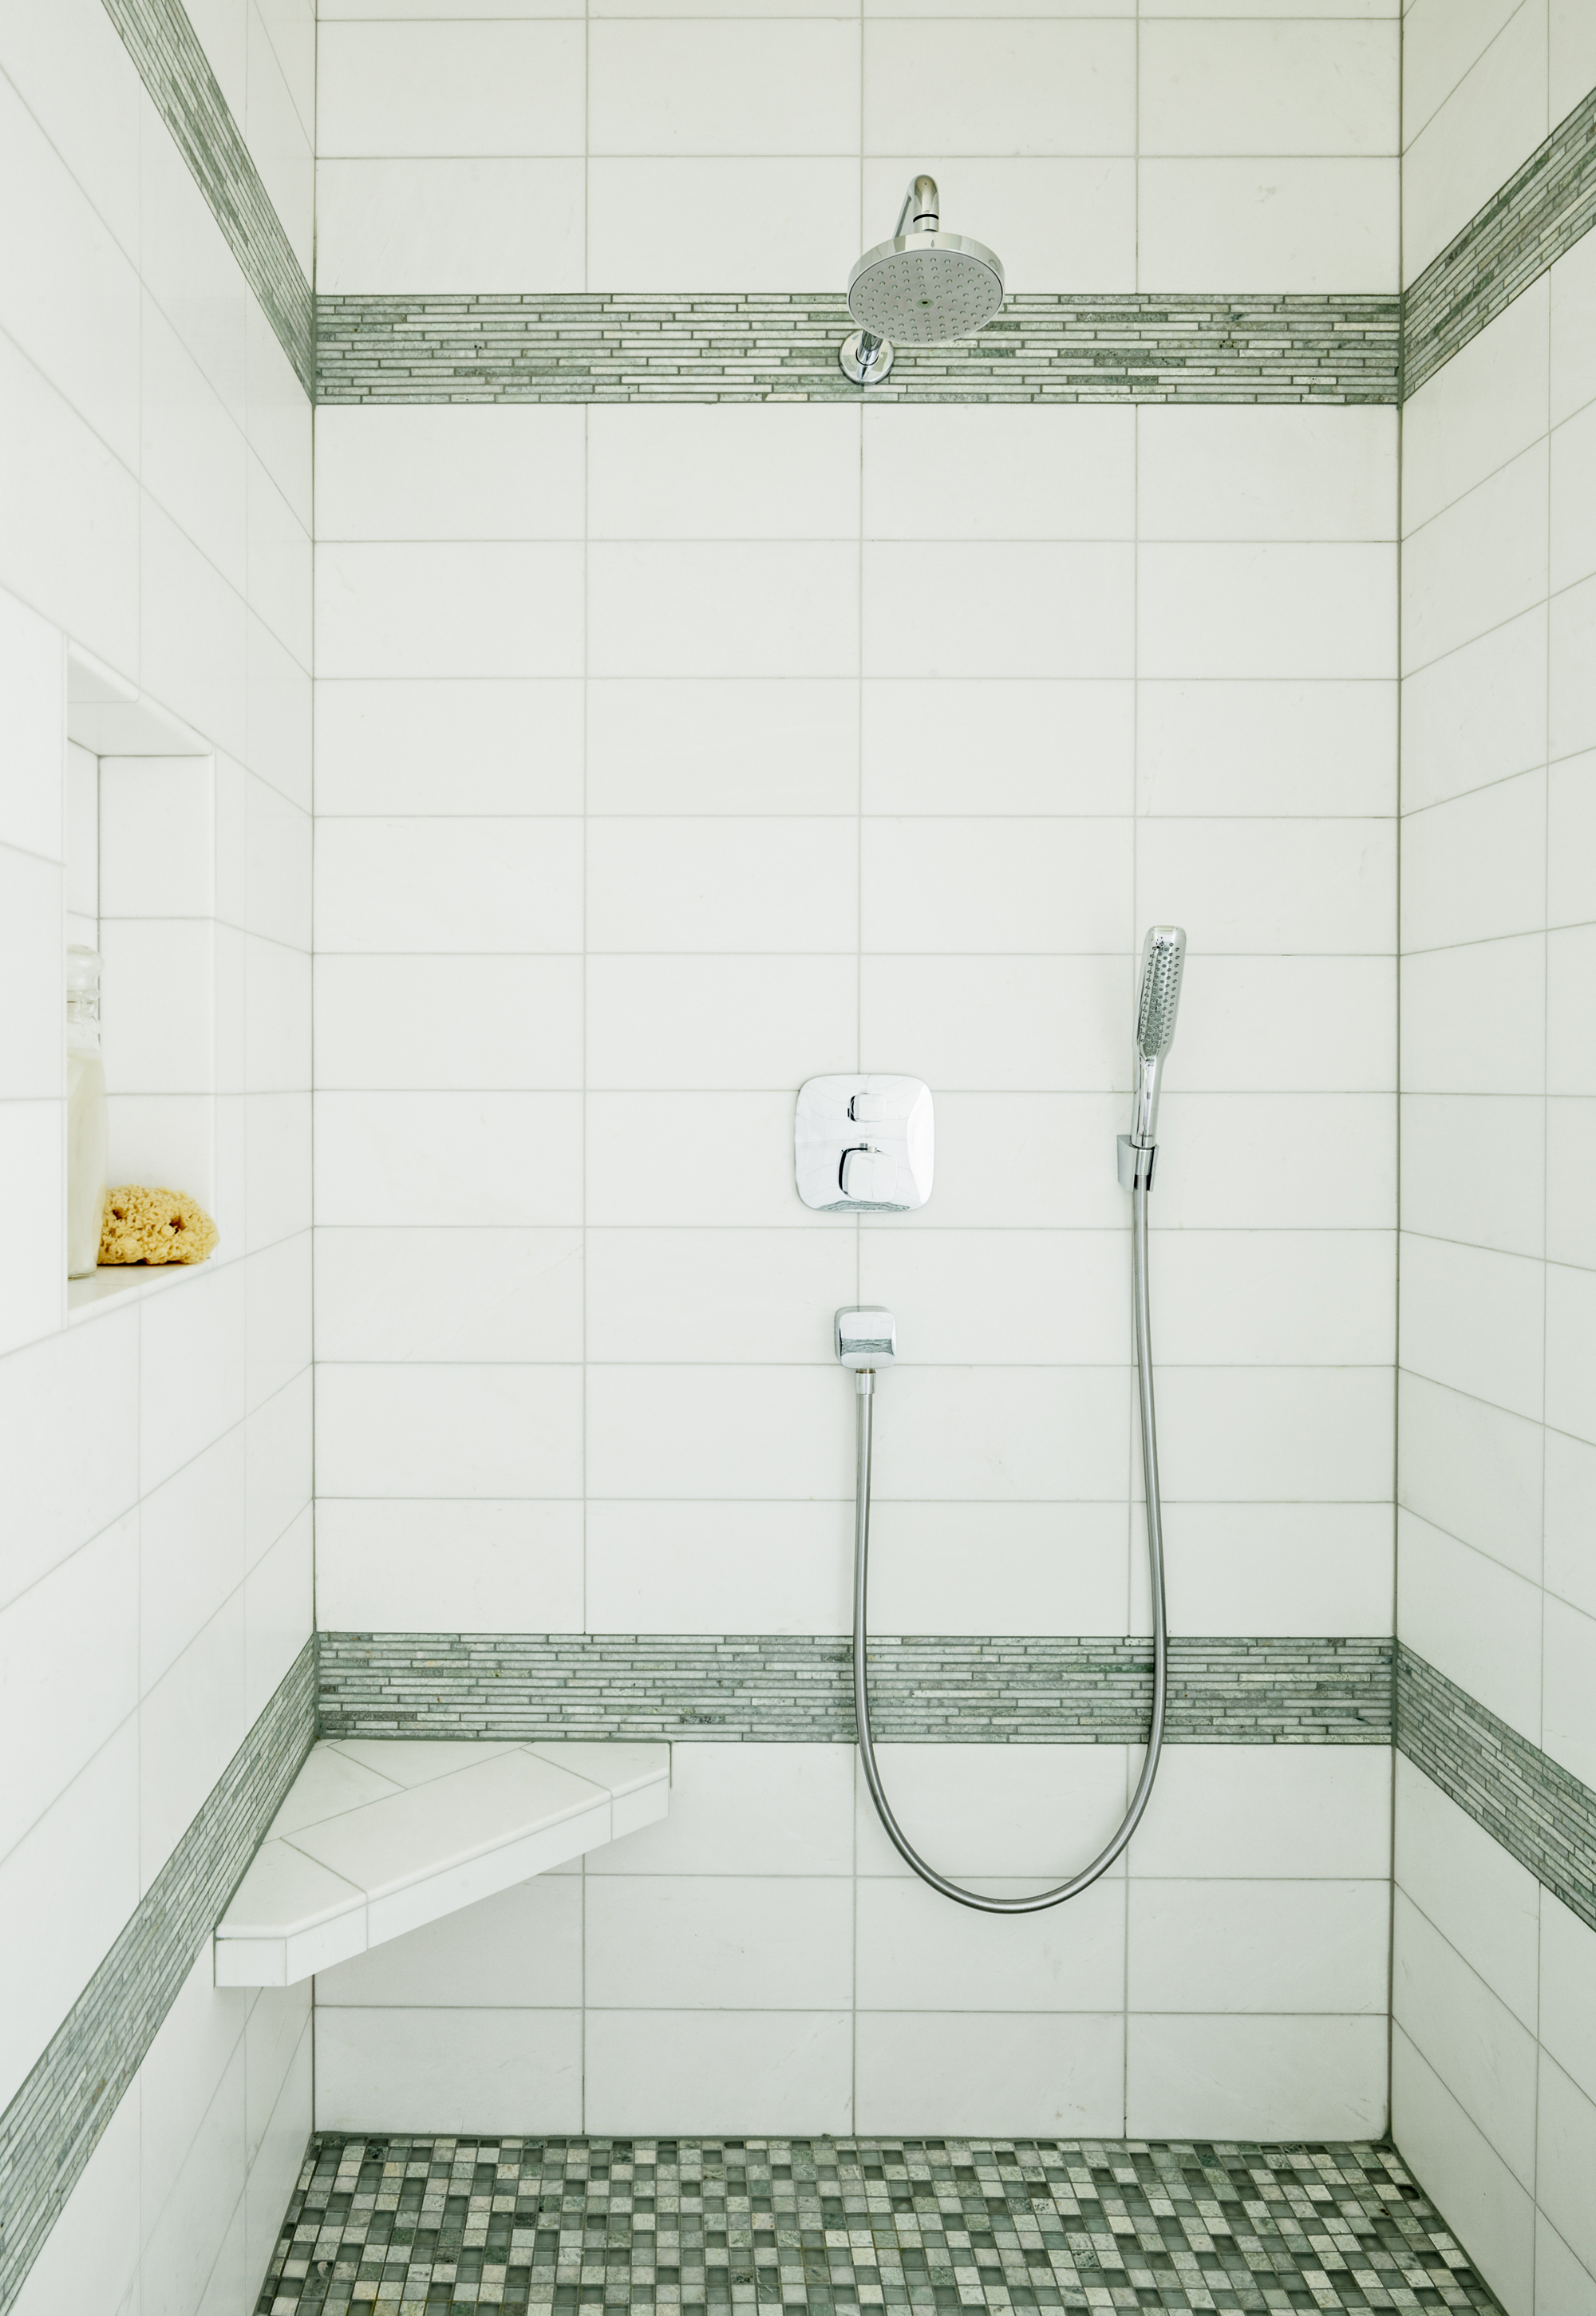 Bathroom shower design by Jenni Leasia Interior Design in Portland